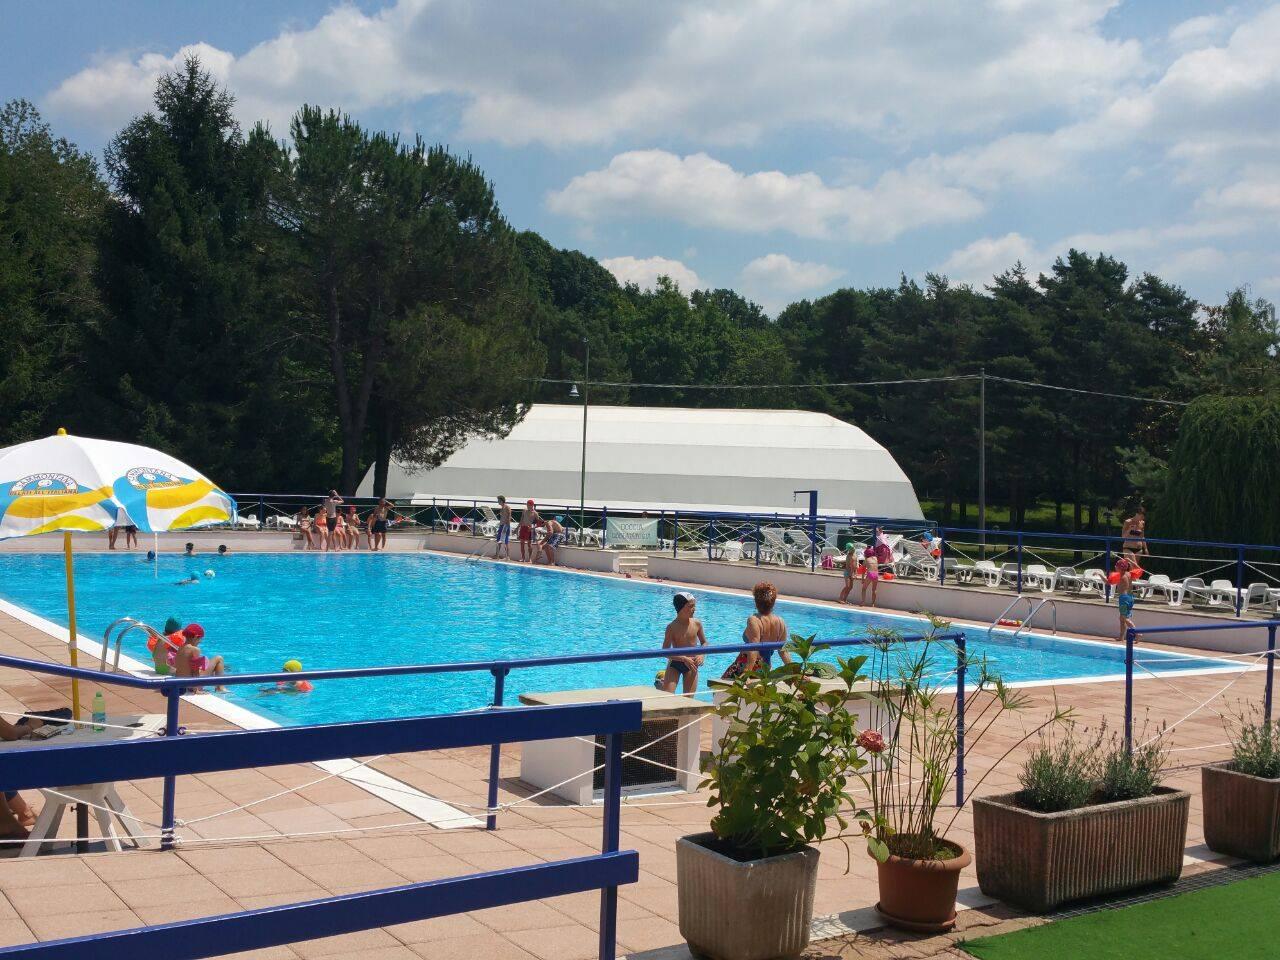 Piscina tennis calcio a 5 pizzeria piscina venegono - Piscina vimercate prezzi ...